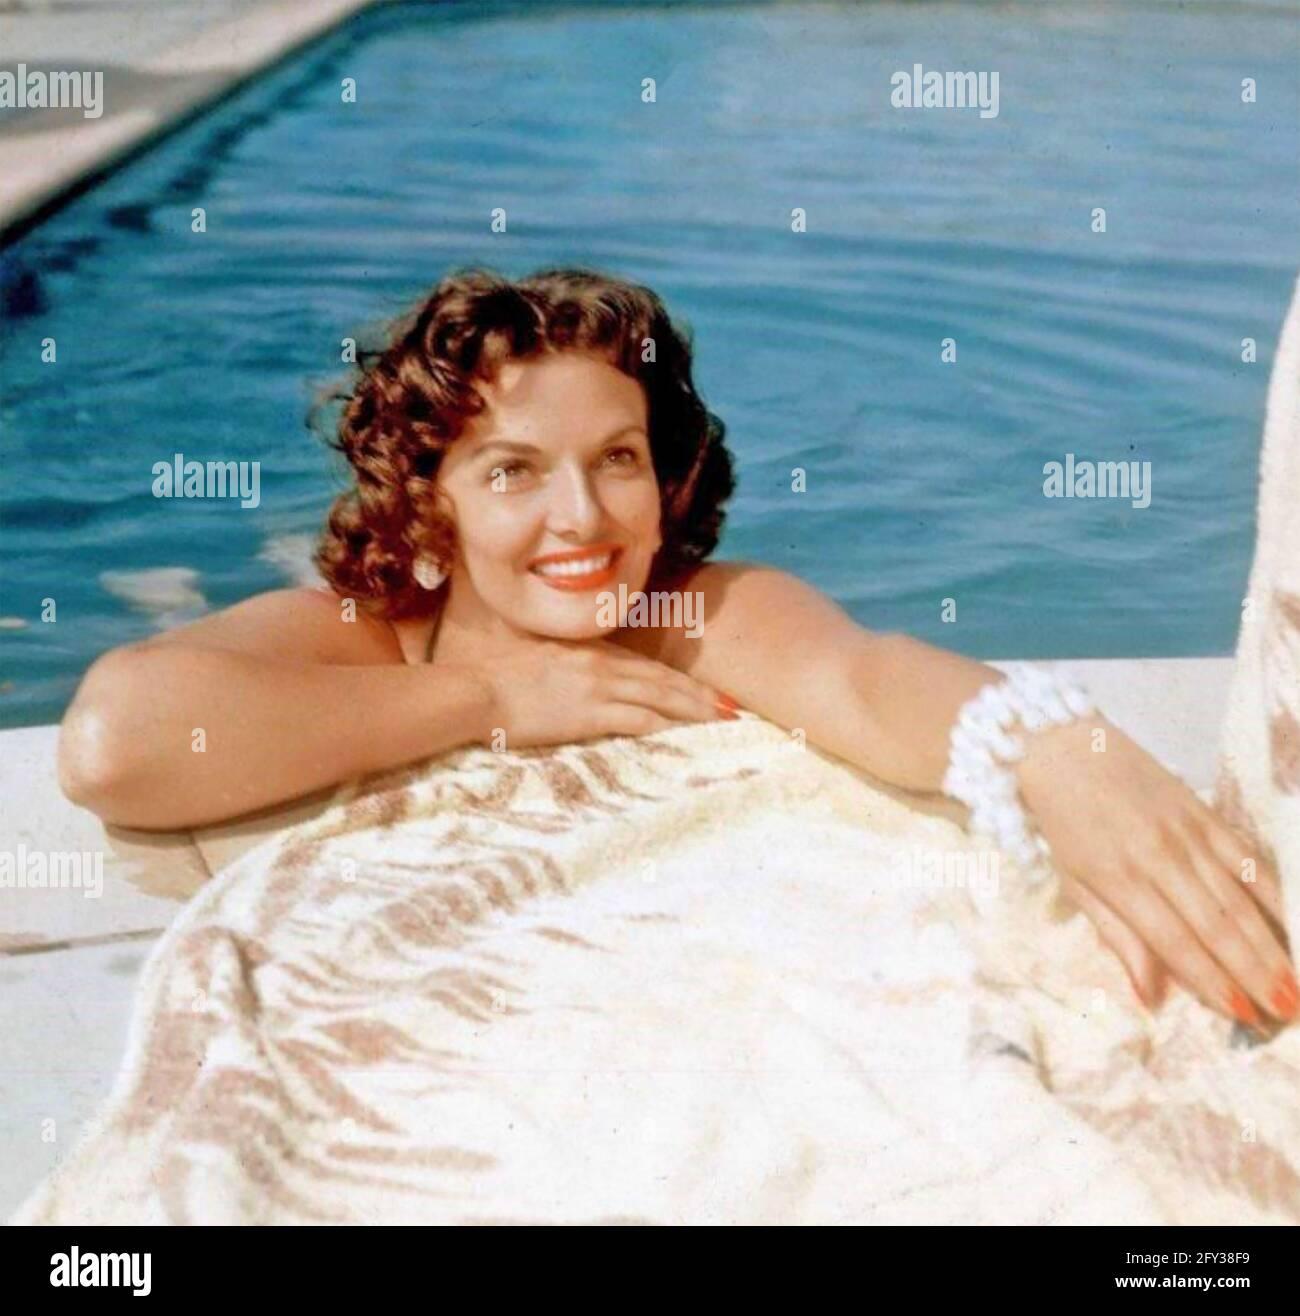 JANE RUSSELL (1921-2011) actrice et chanteuse américaine vers 1953 Banque D'Images